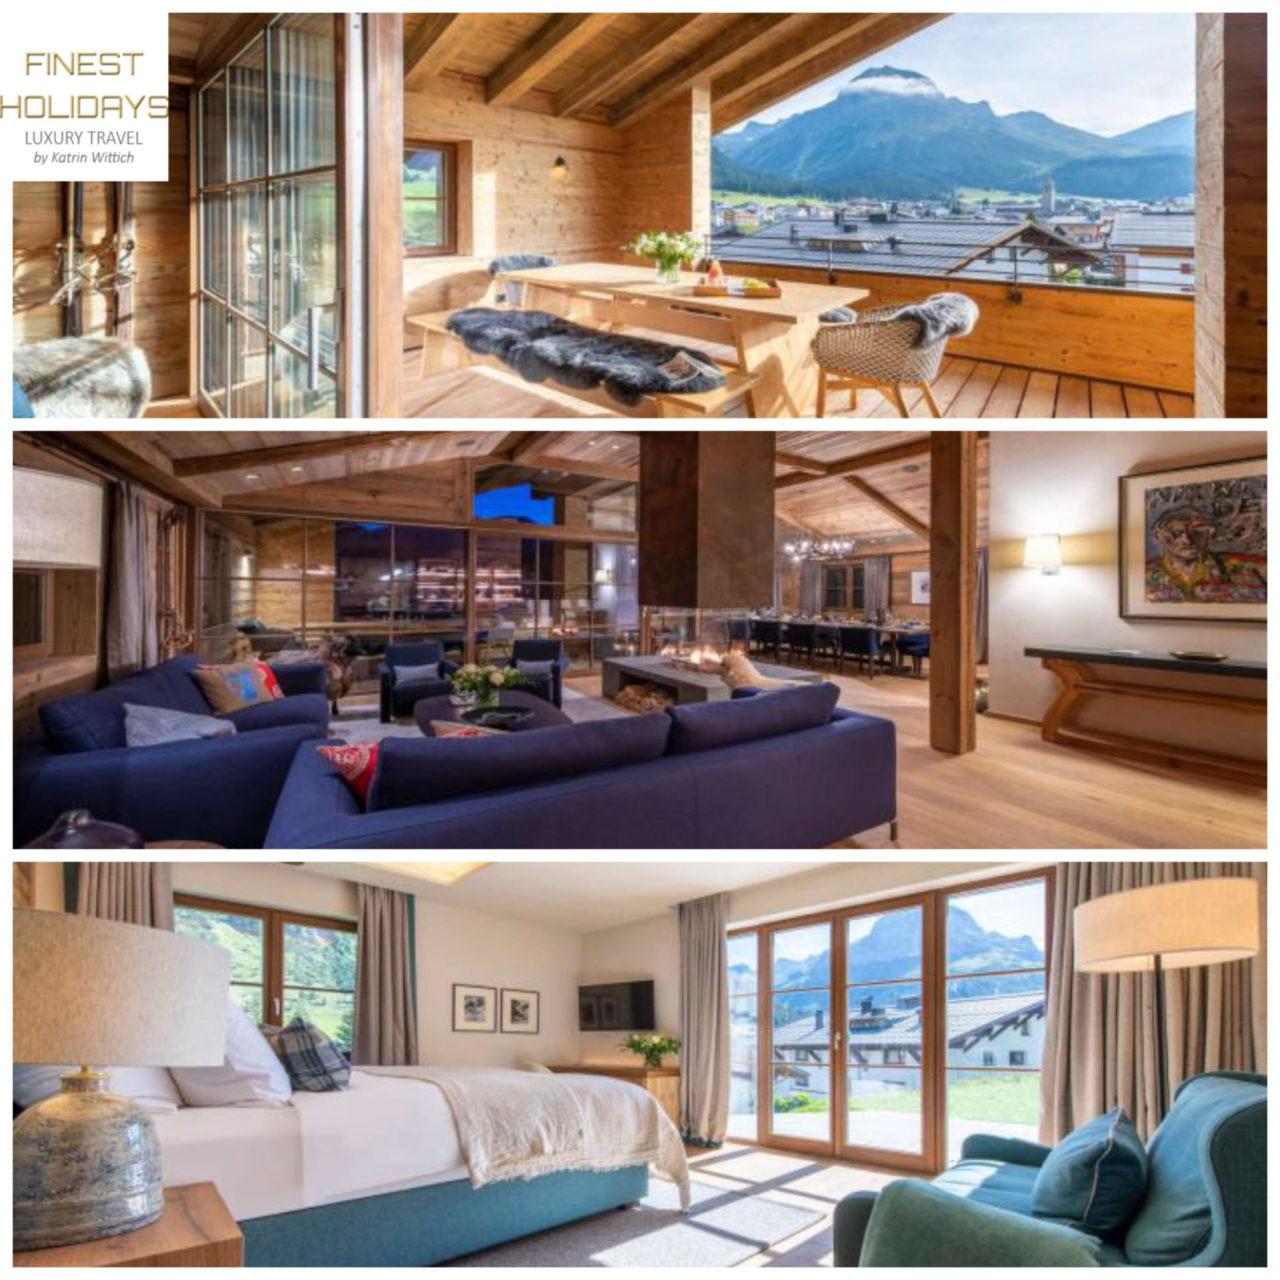 www.finest-holidays.com Austrian Alps, Lech, luxury ski chalet Chalech 1, Austria